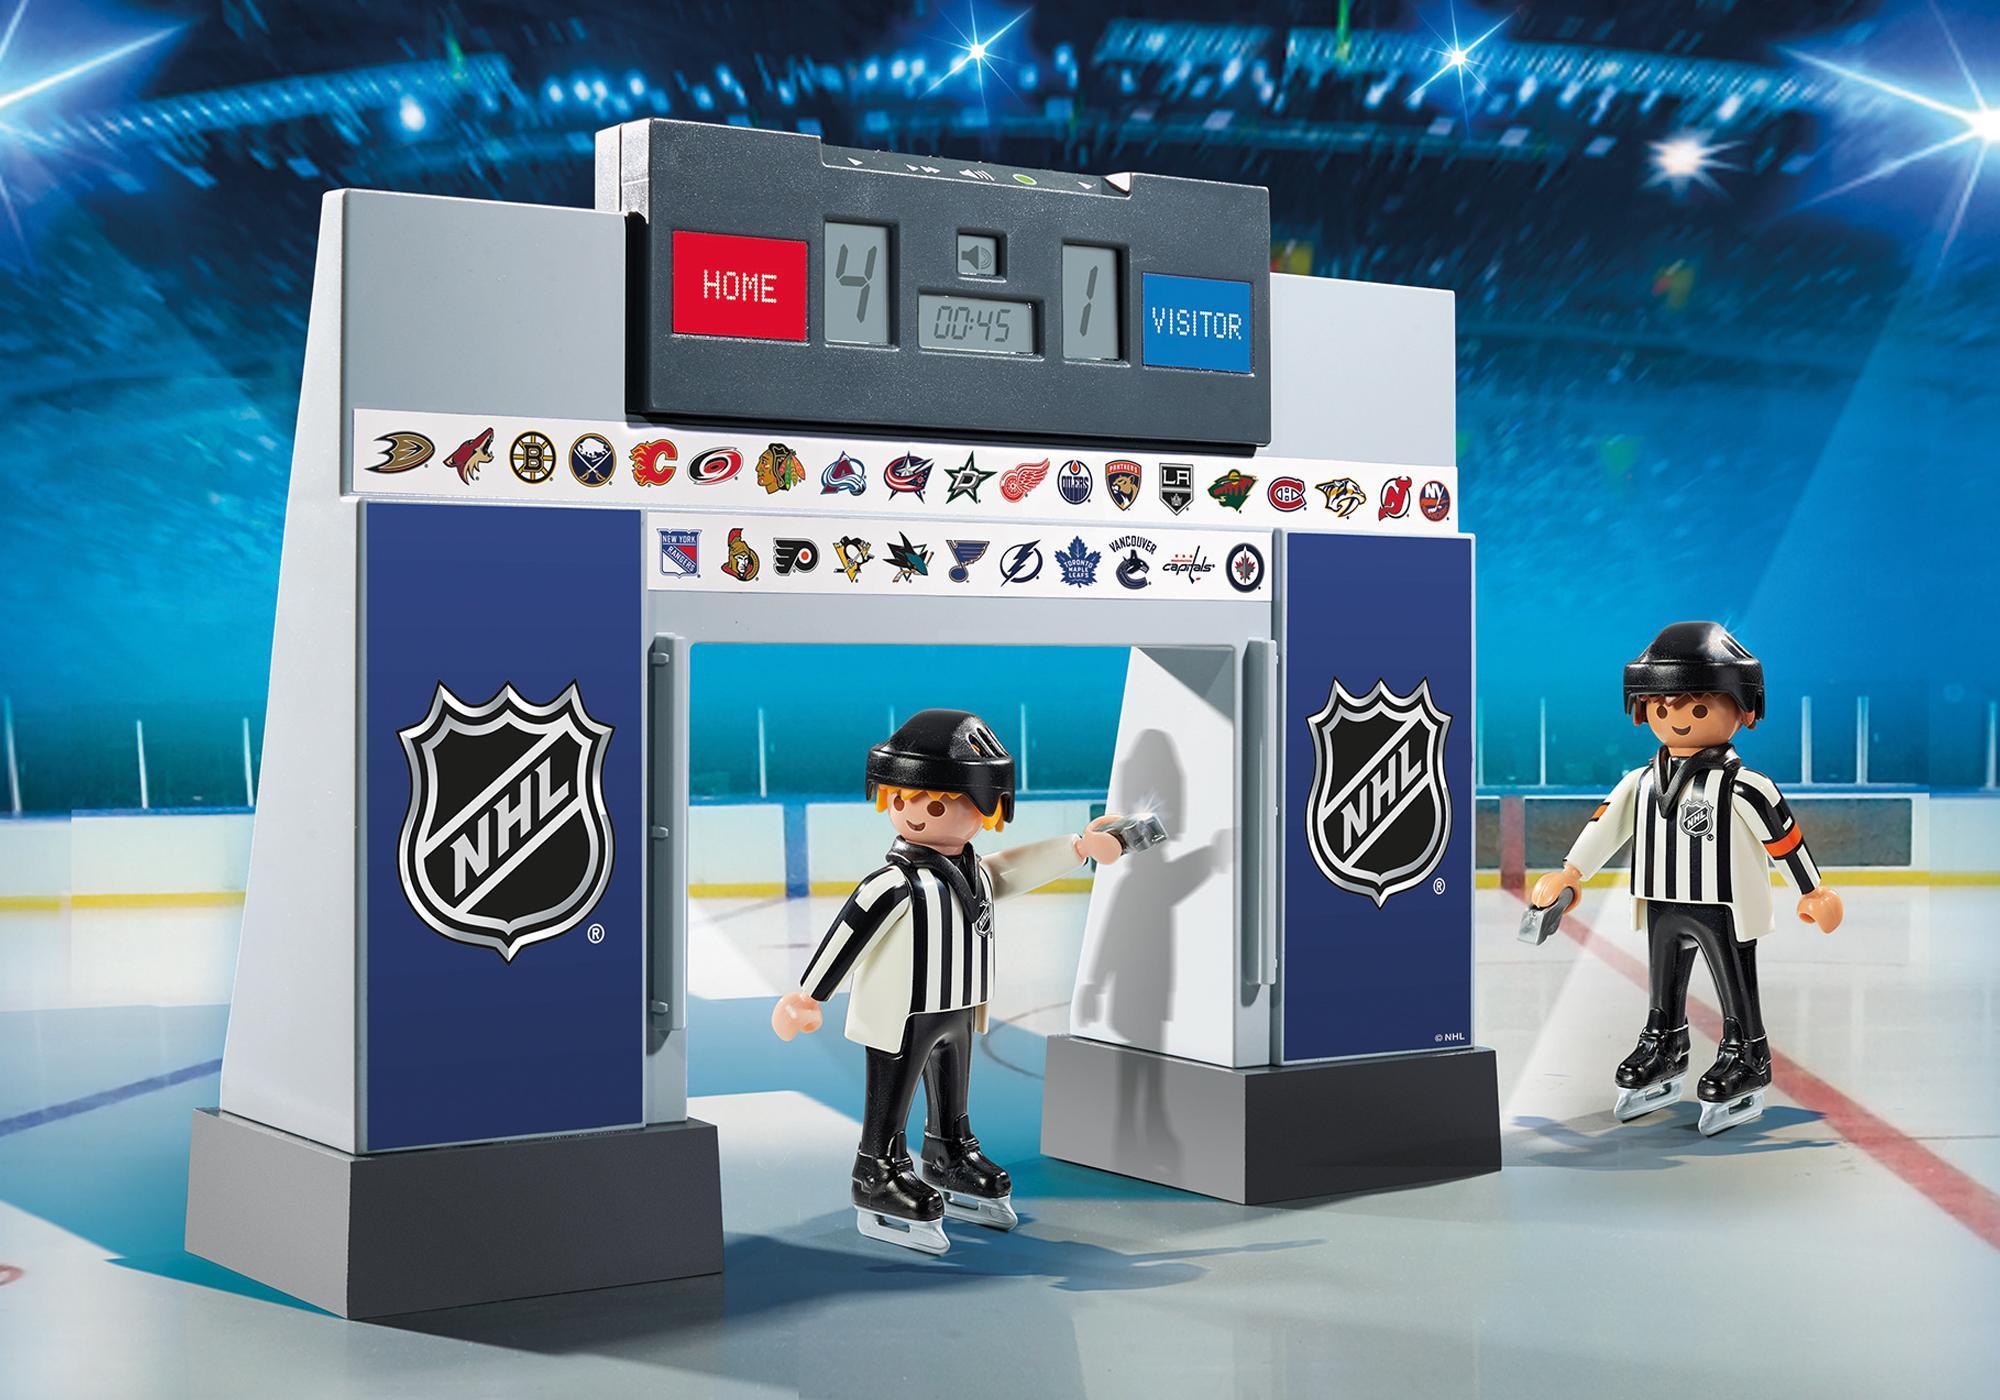 http://media.playmobil.com/i/playmobil/9016_product_detail/NHL™ Score Clock  with 2 Referees